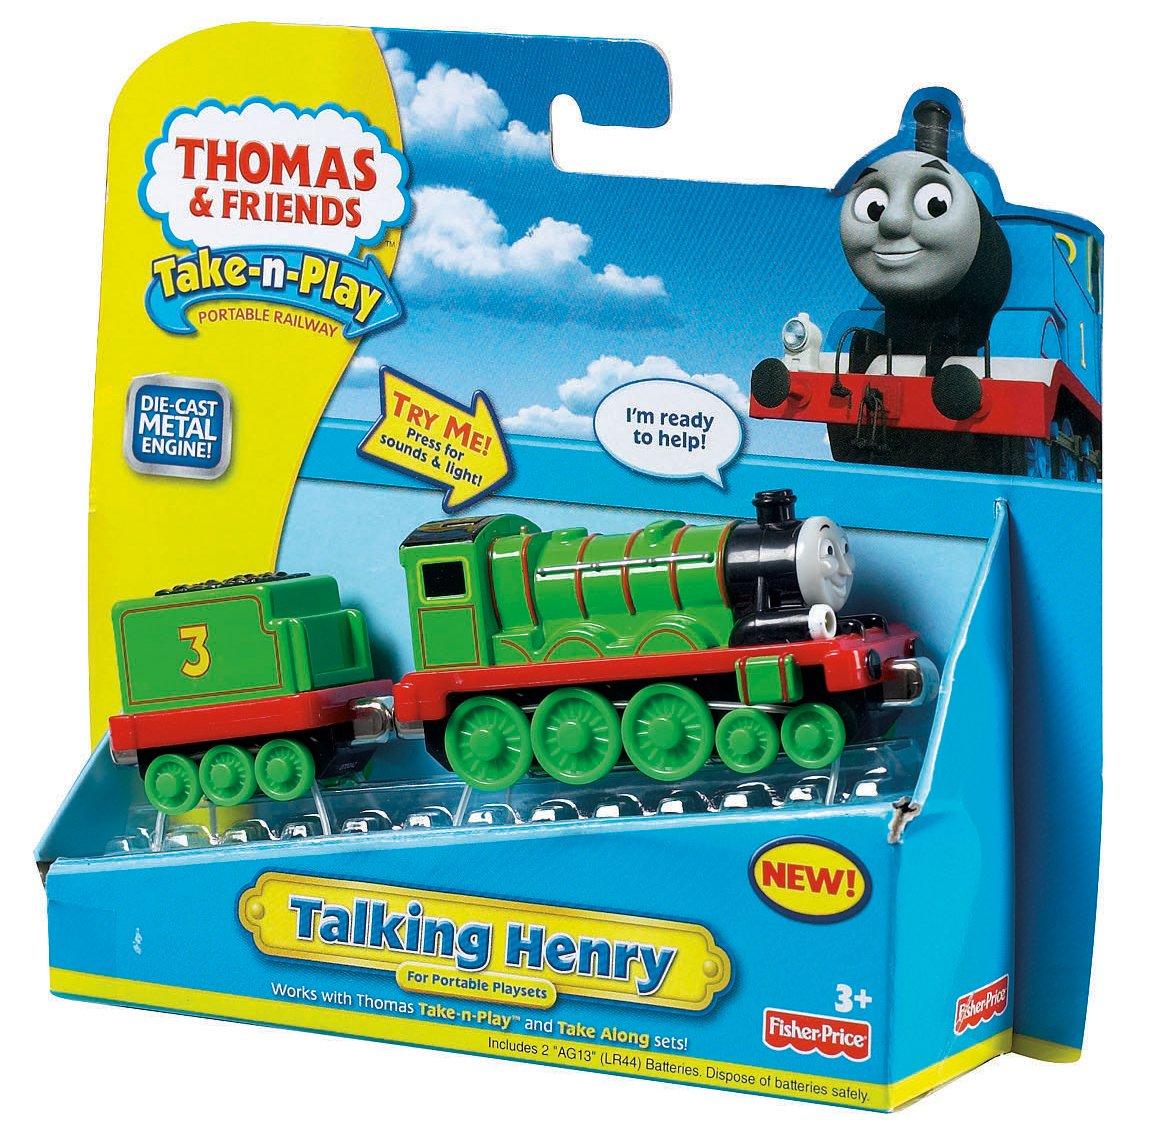 Thomas the train full size sheets - Thomas The Train Full Size Sheets 29